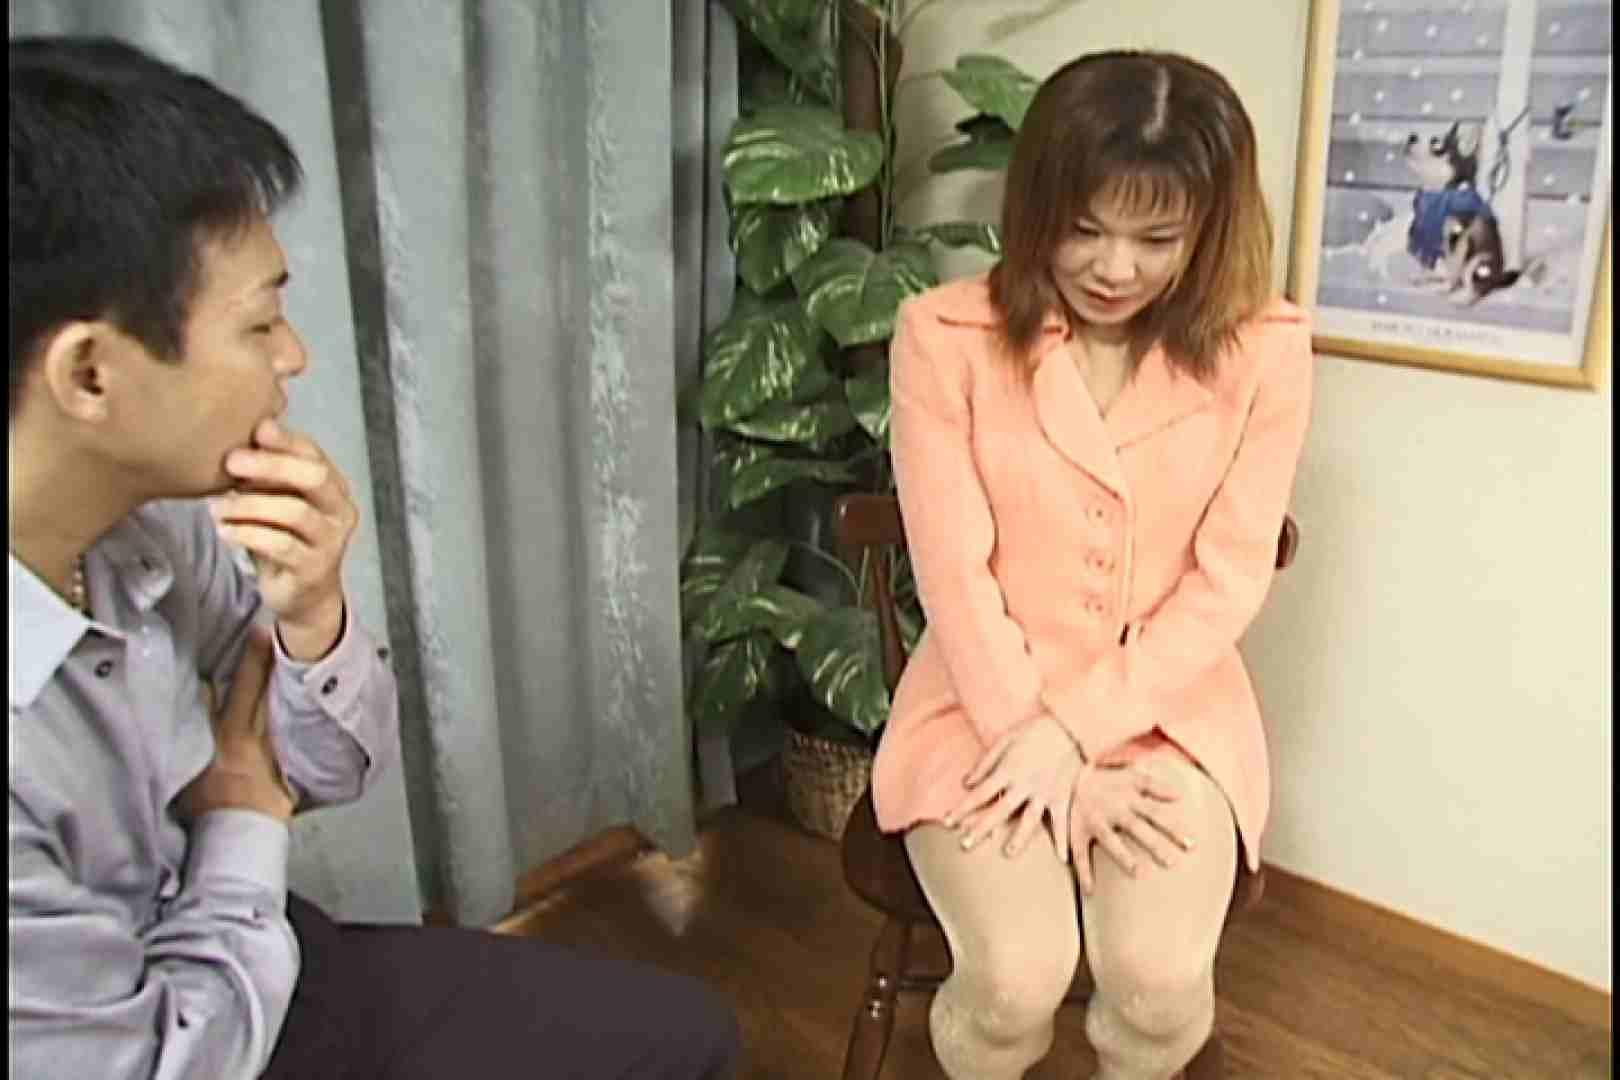 昼間の奥様は欲求不満 ~桜井昌子~ フェラ SEX無修正画像 60連発 11